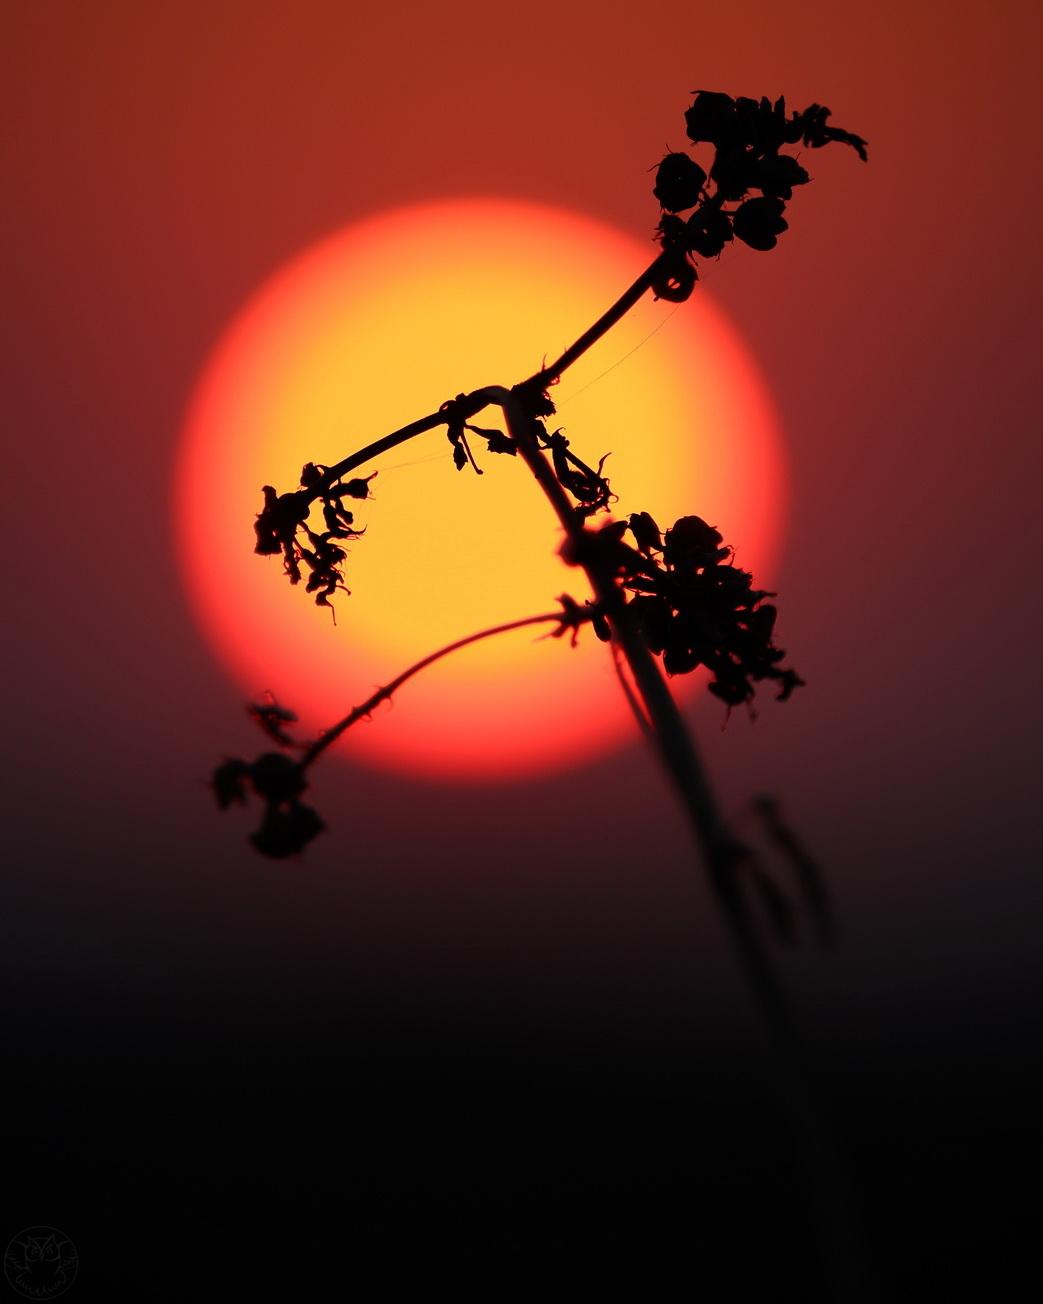 wschód słońca i badyle